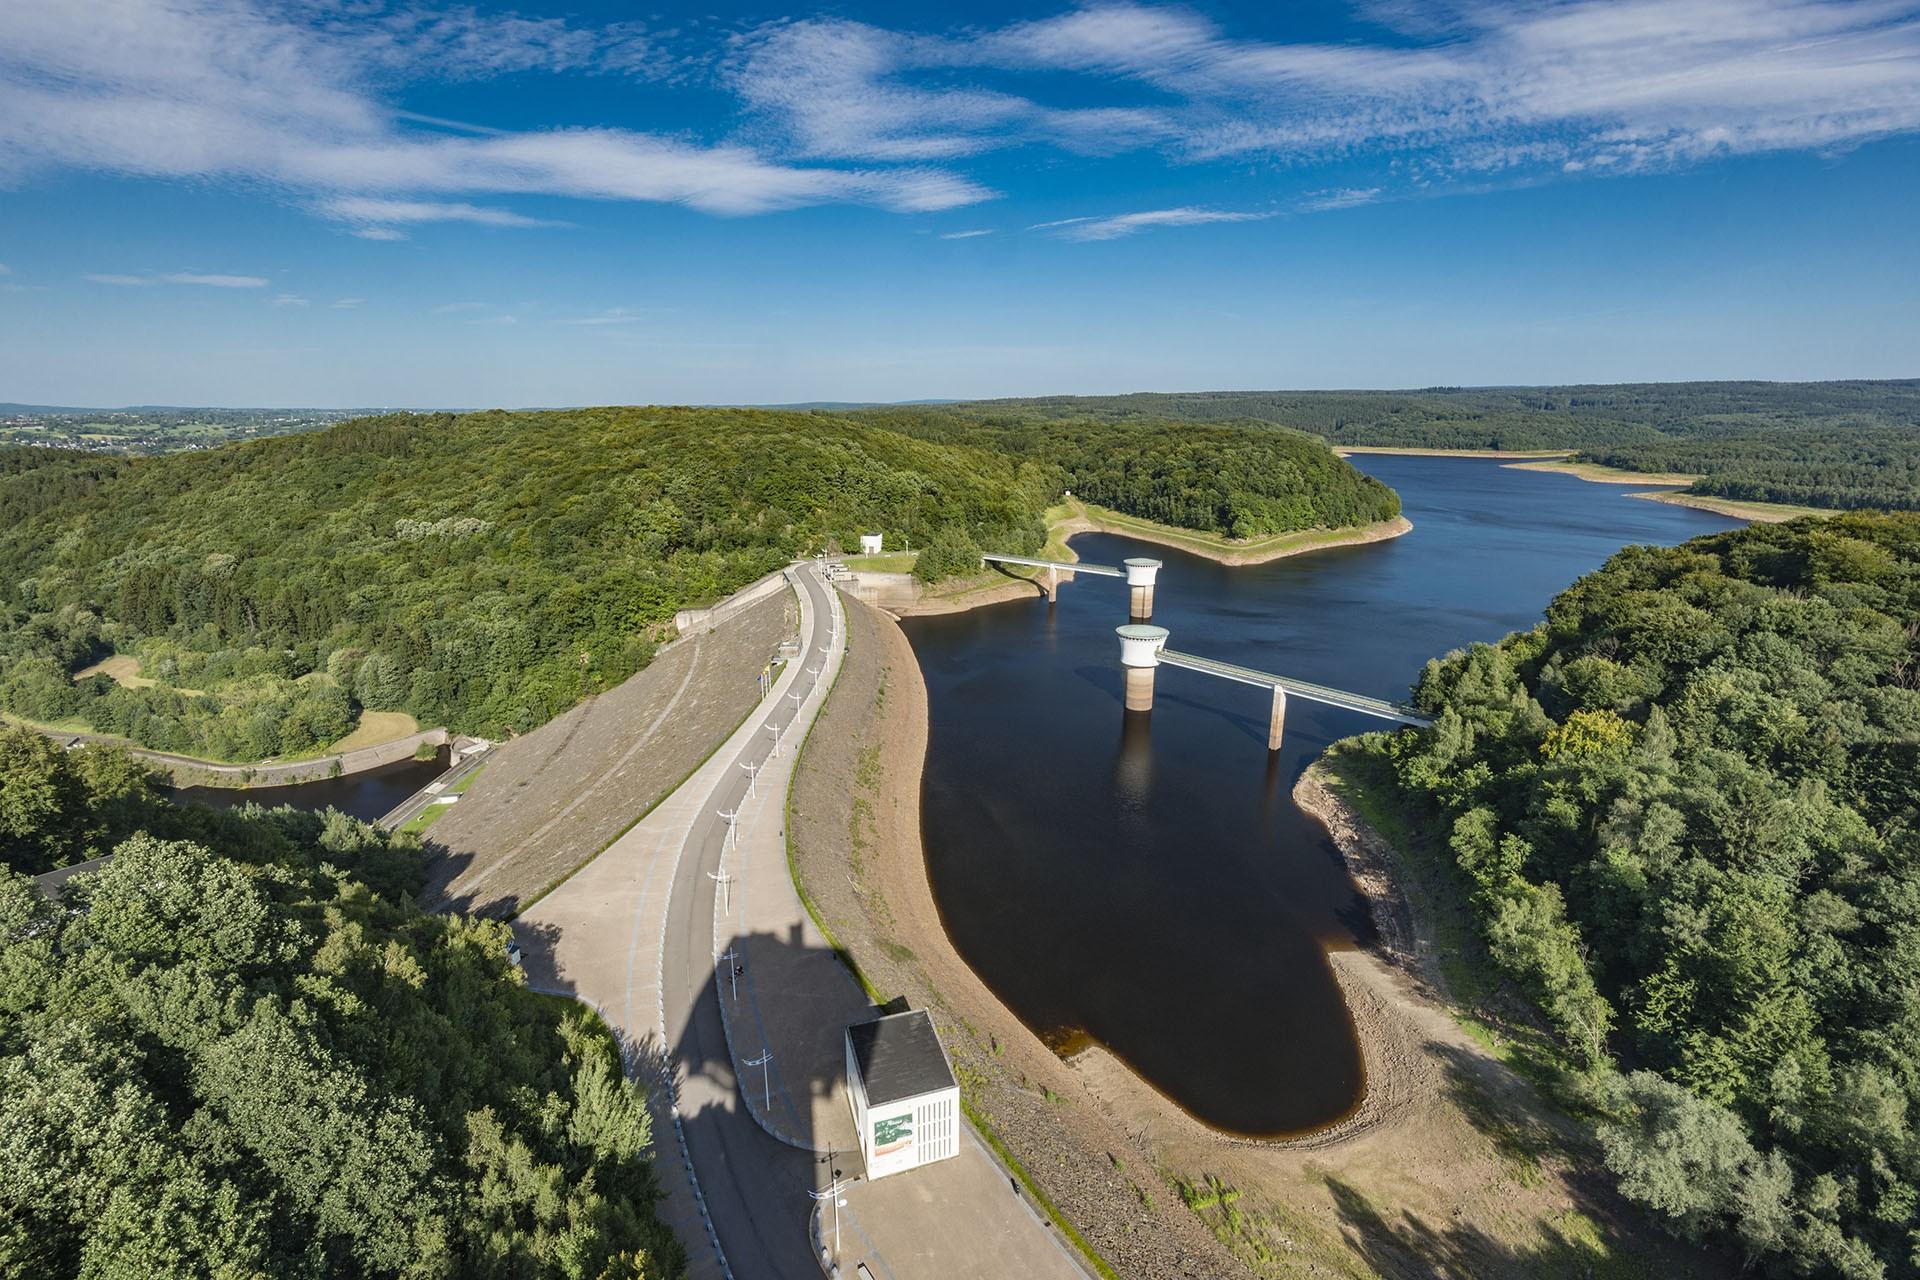 The Gileppe dam